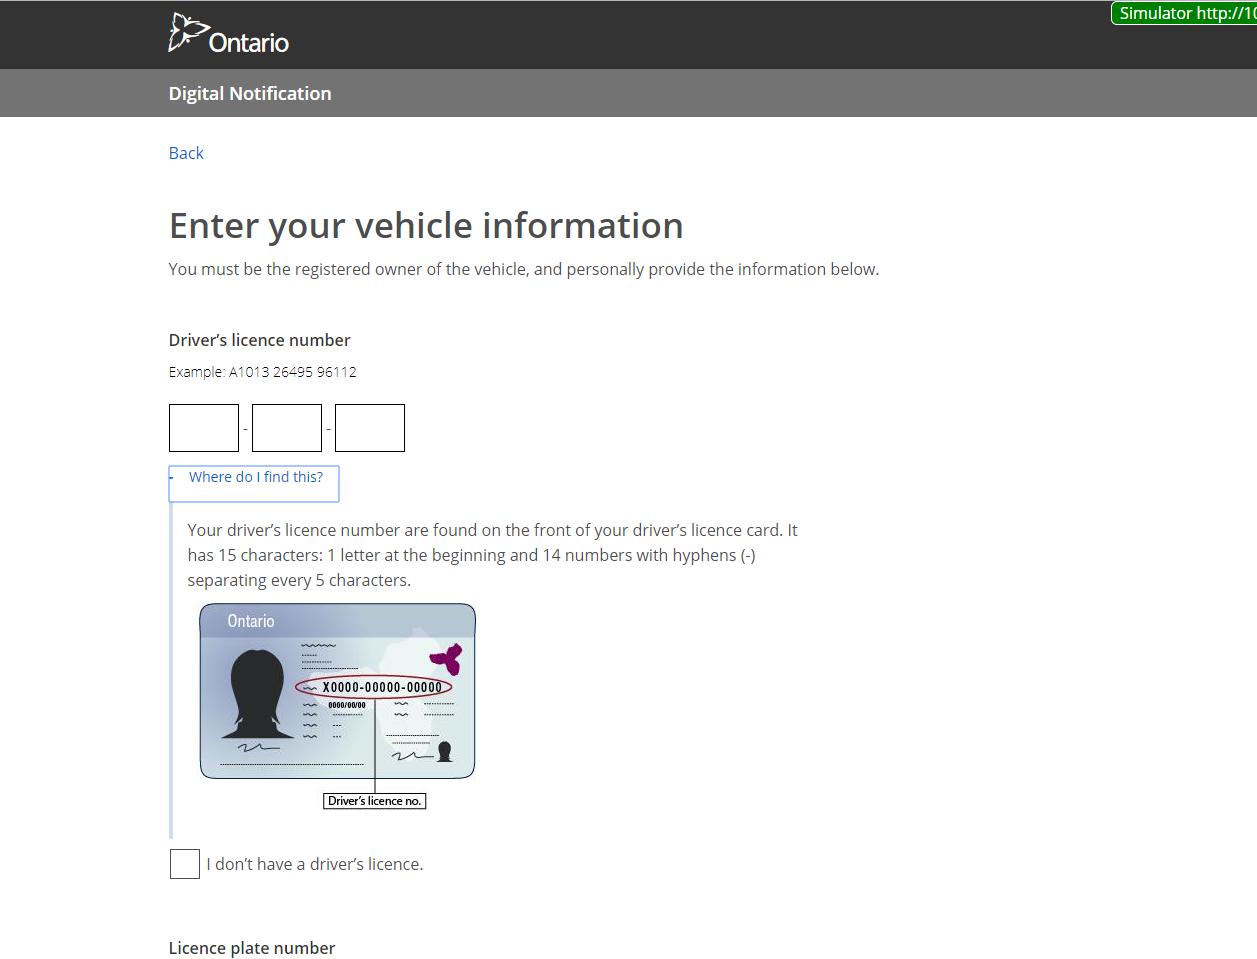 Digital Electronic Notification vehicle information